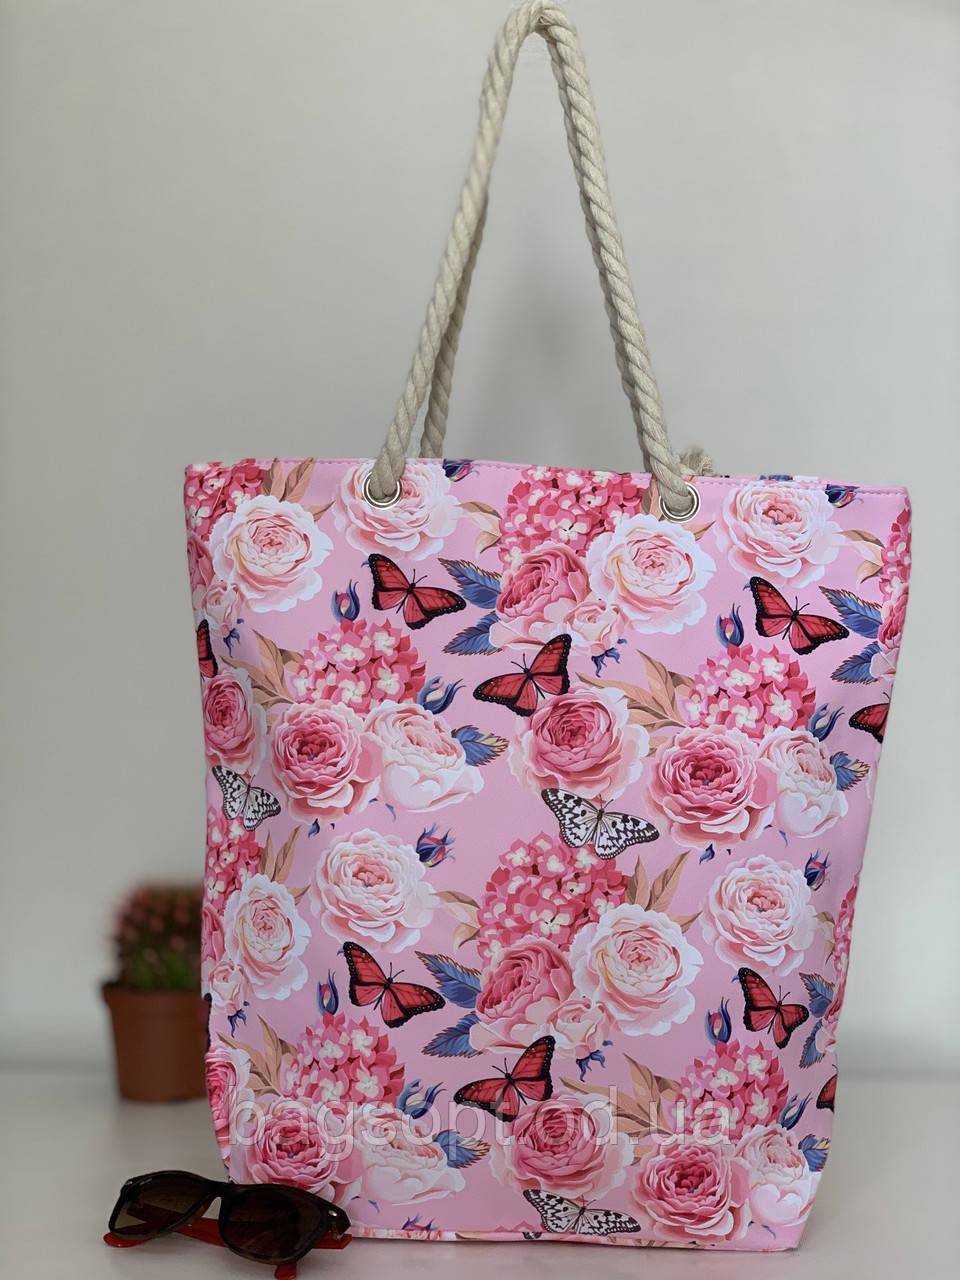 Текстильная пляжная сумка шоппер летняя розовая